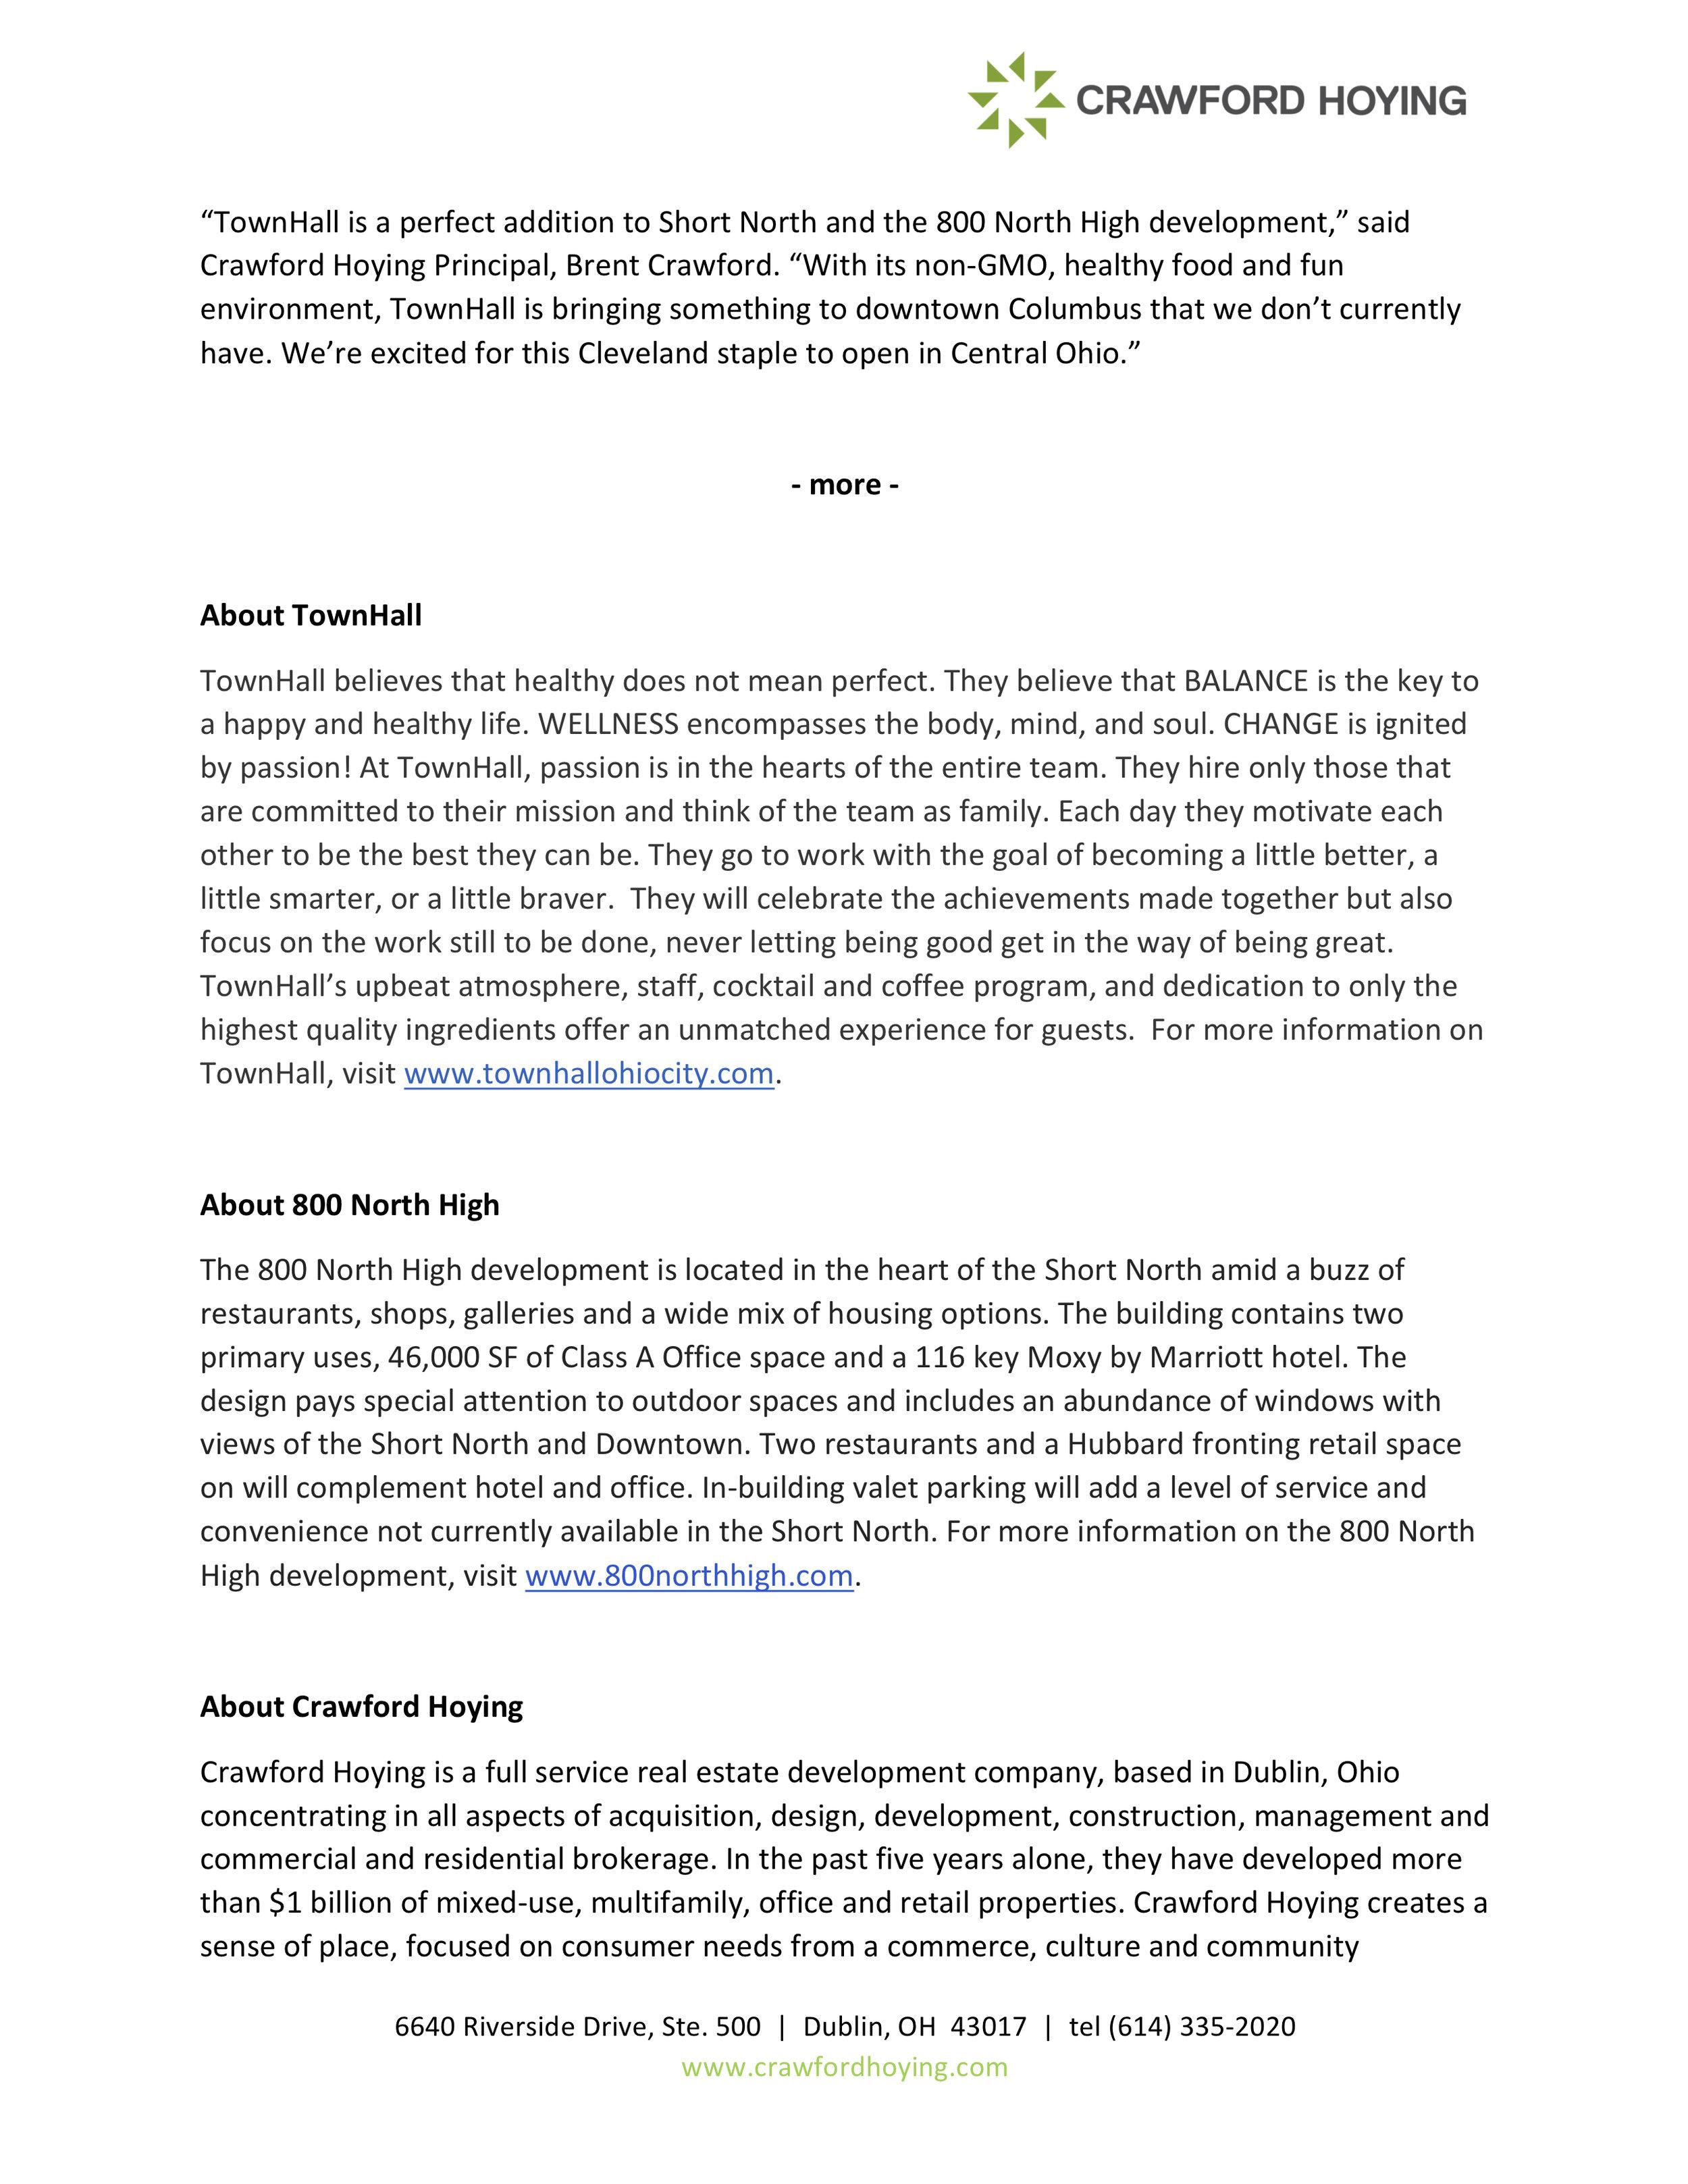 TOWNHALL COLUMBUS - PRESS RELEASE PG 2.jpg